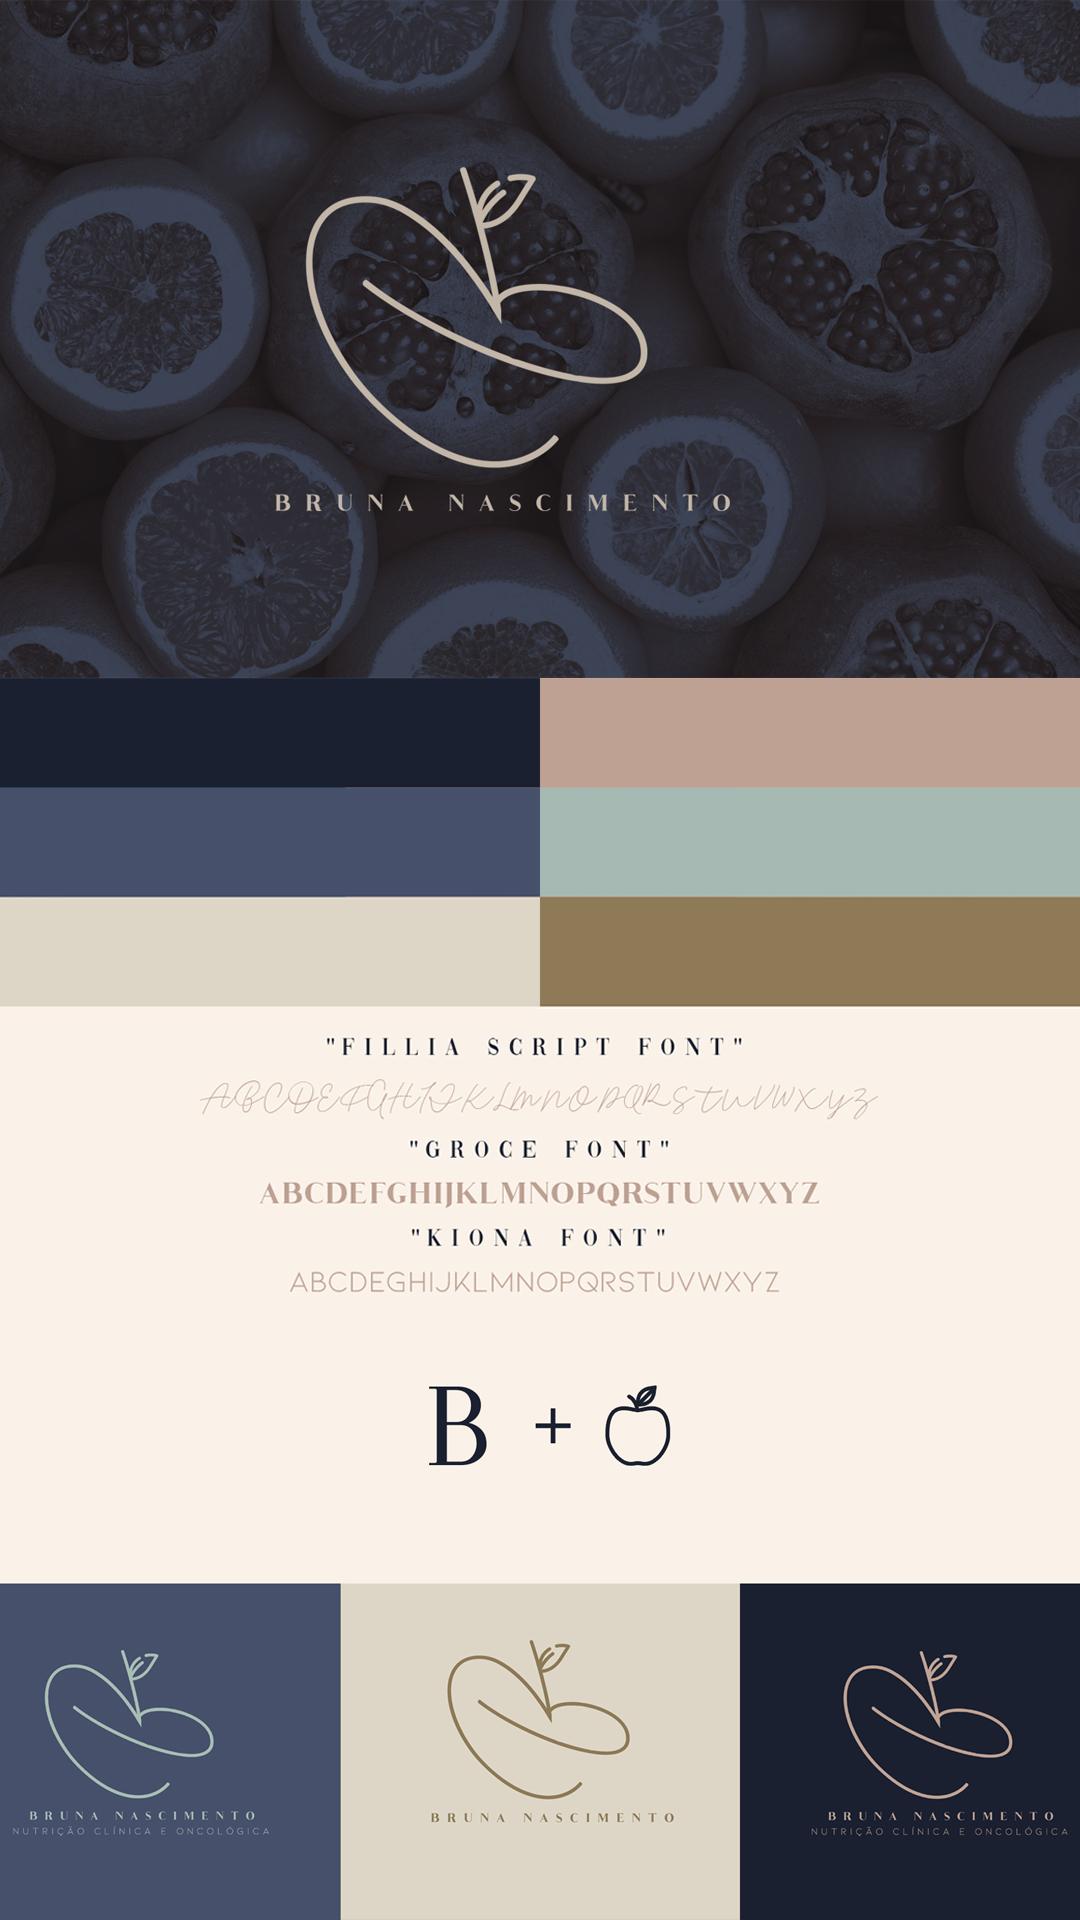 Brand Design Inspiration, Brand Styling Design, Brand